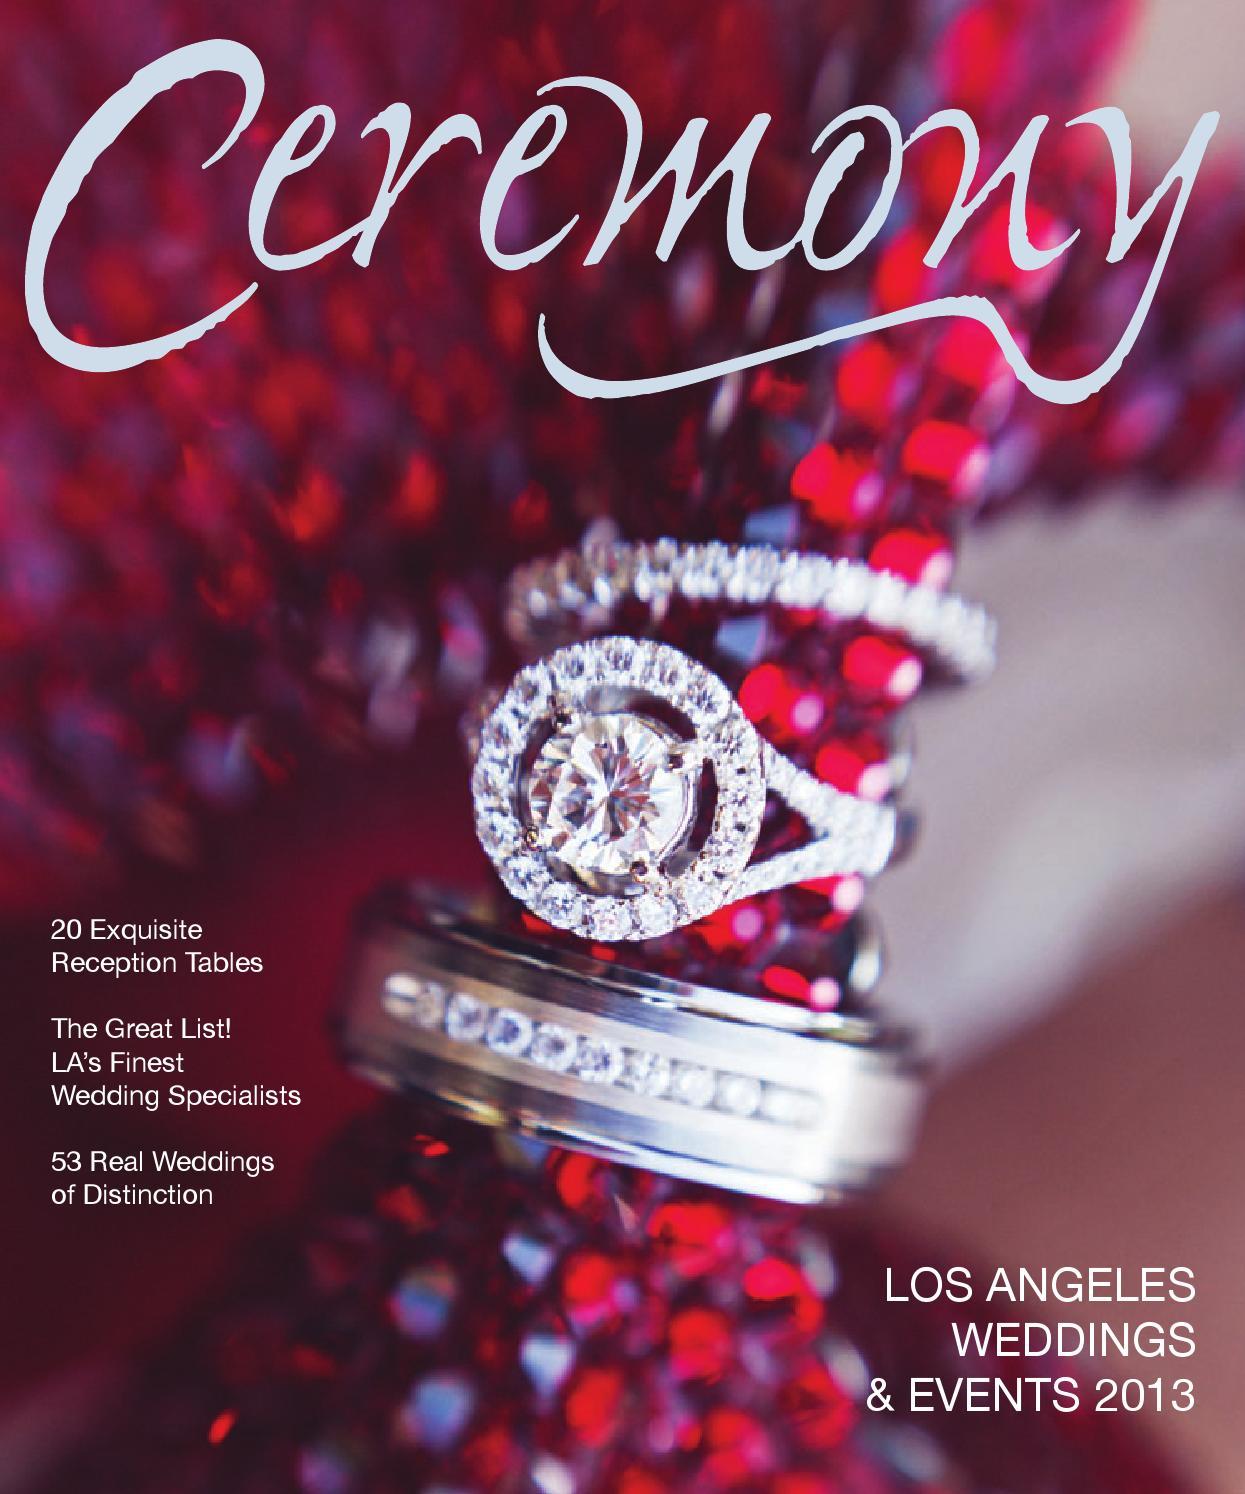 df9881df1 Ceremony Magazine 2013 Los Angeles by Ceremony Magazine - issuu